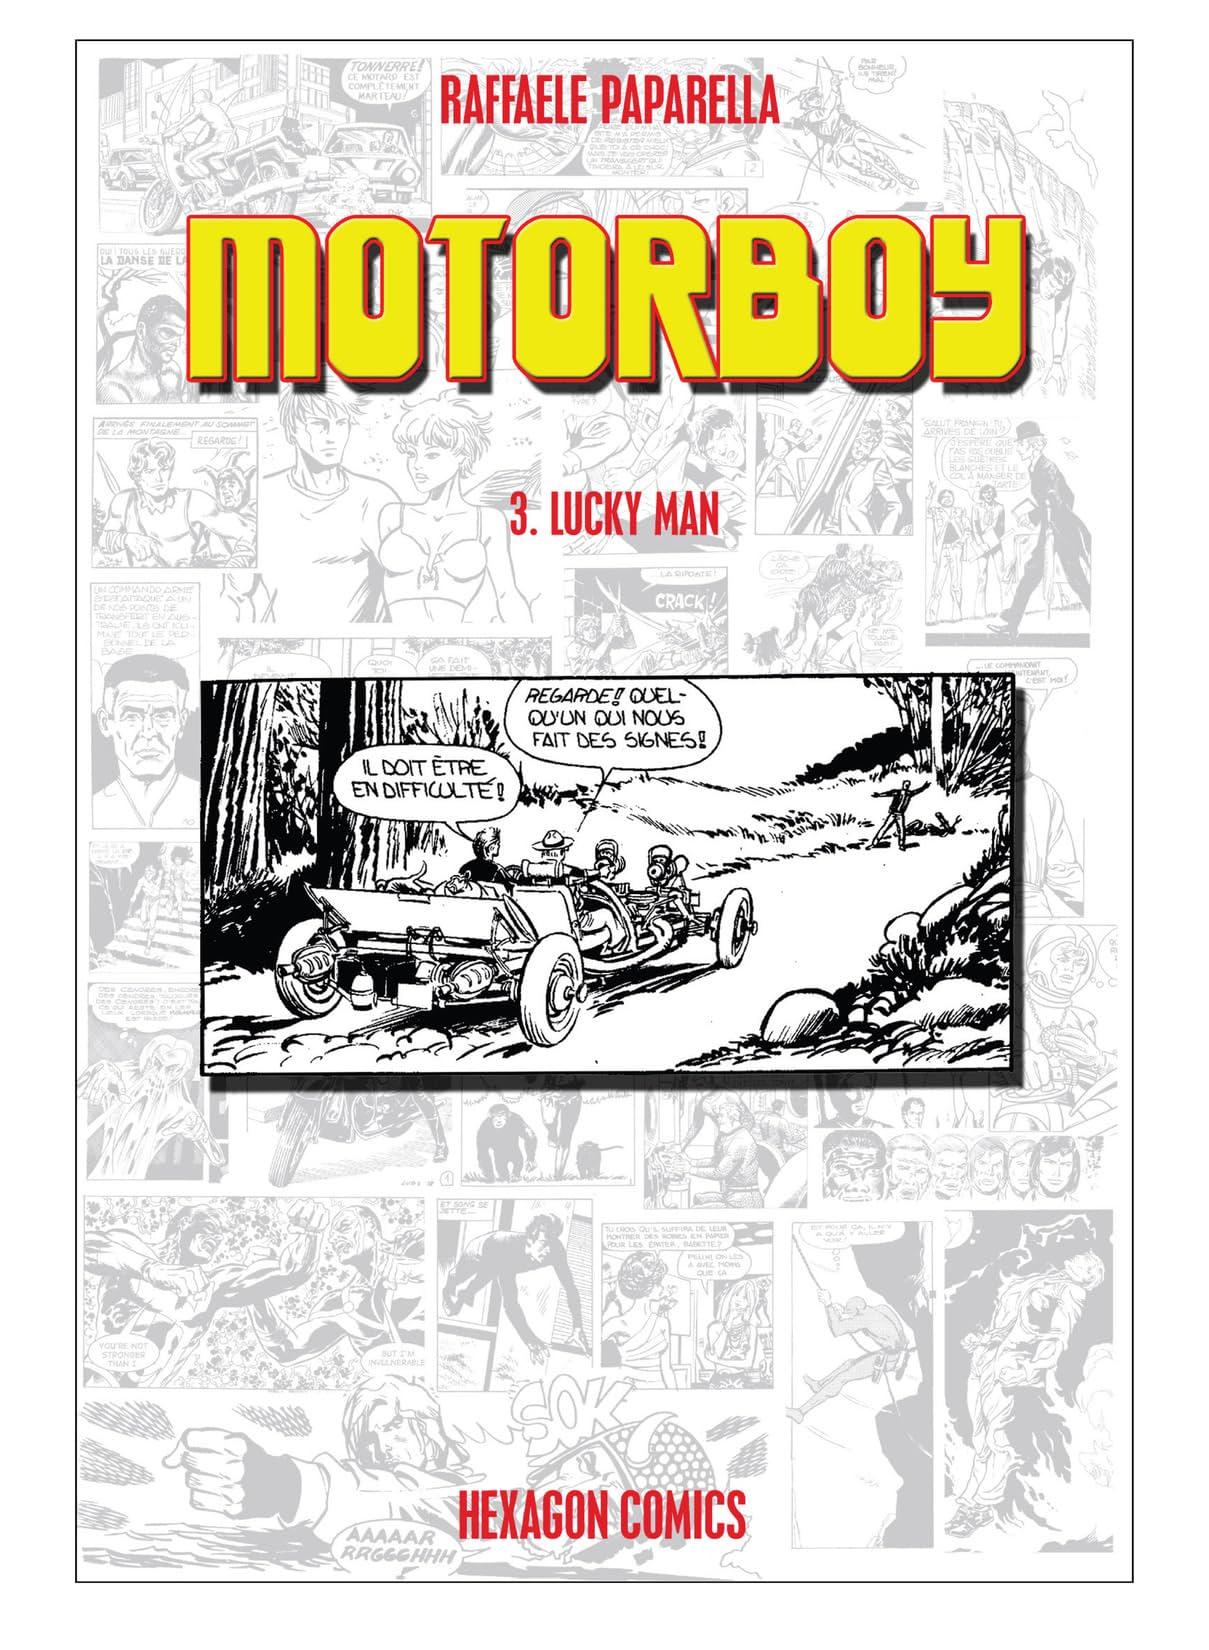 Motorboy #3: Lucky Man